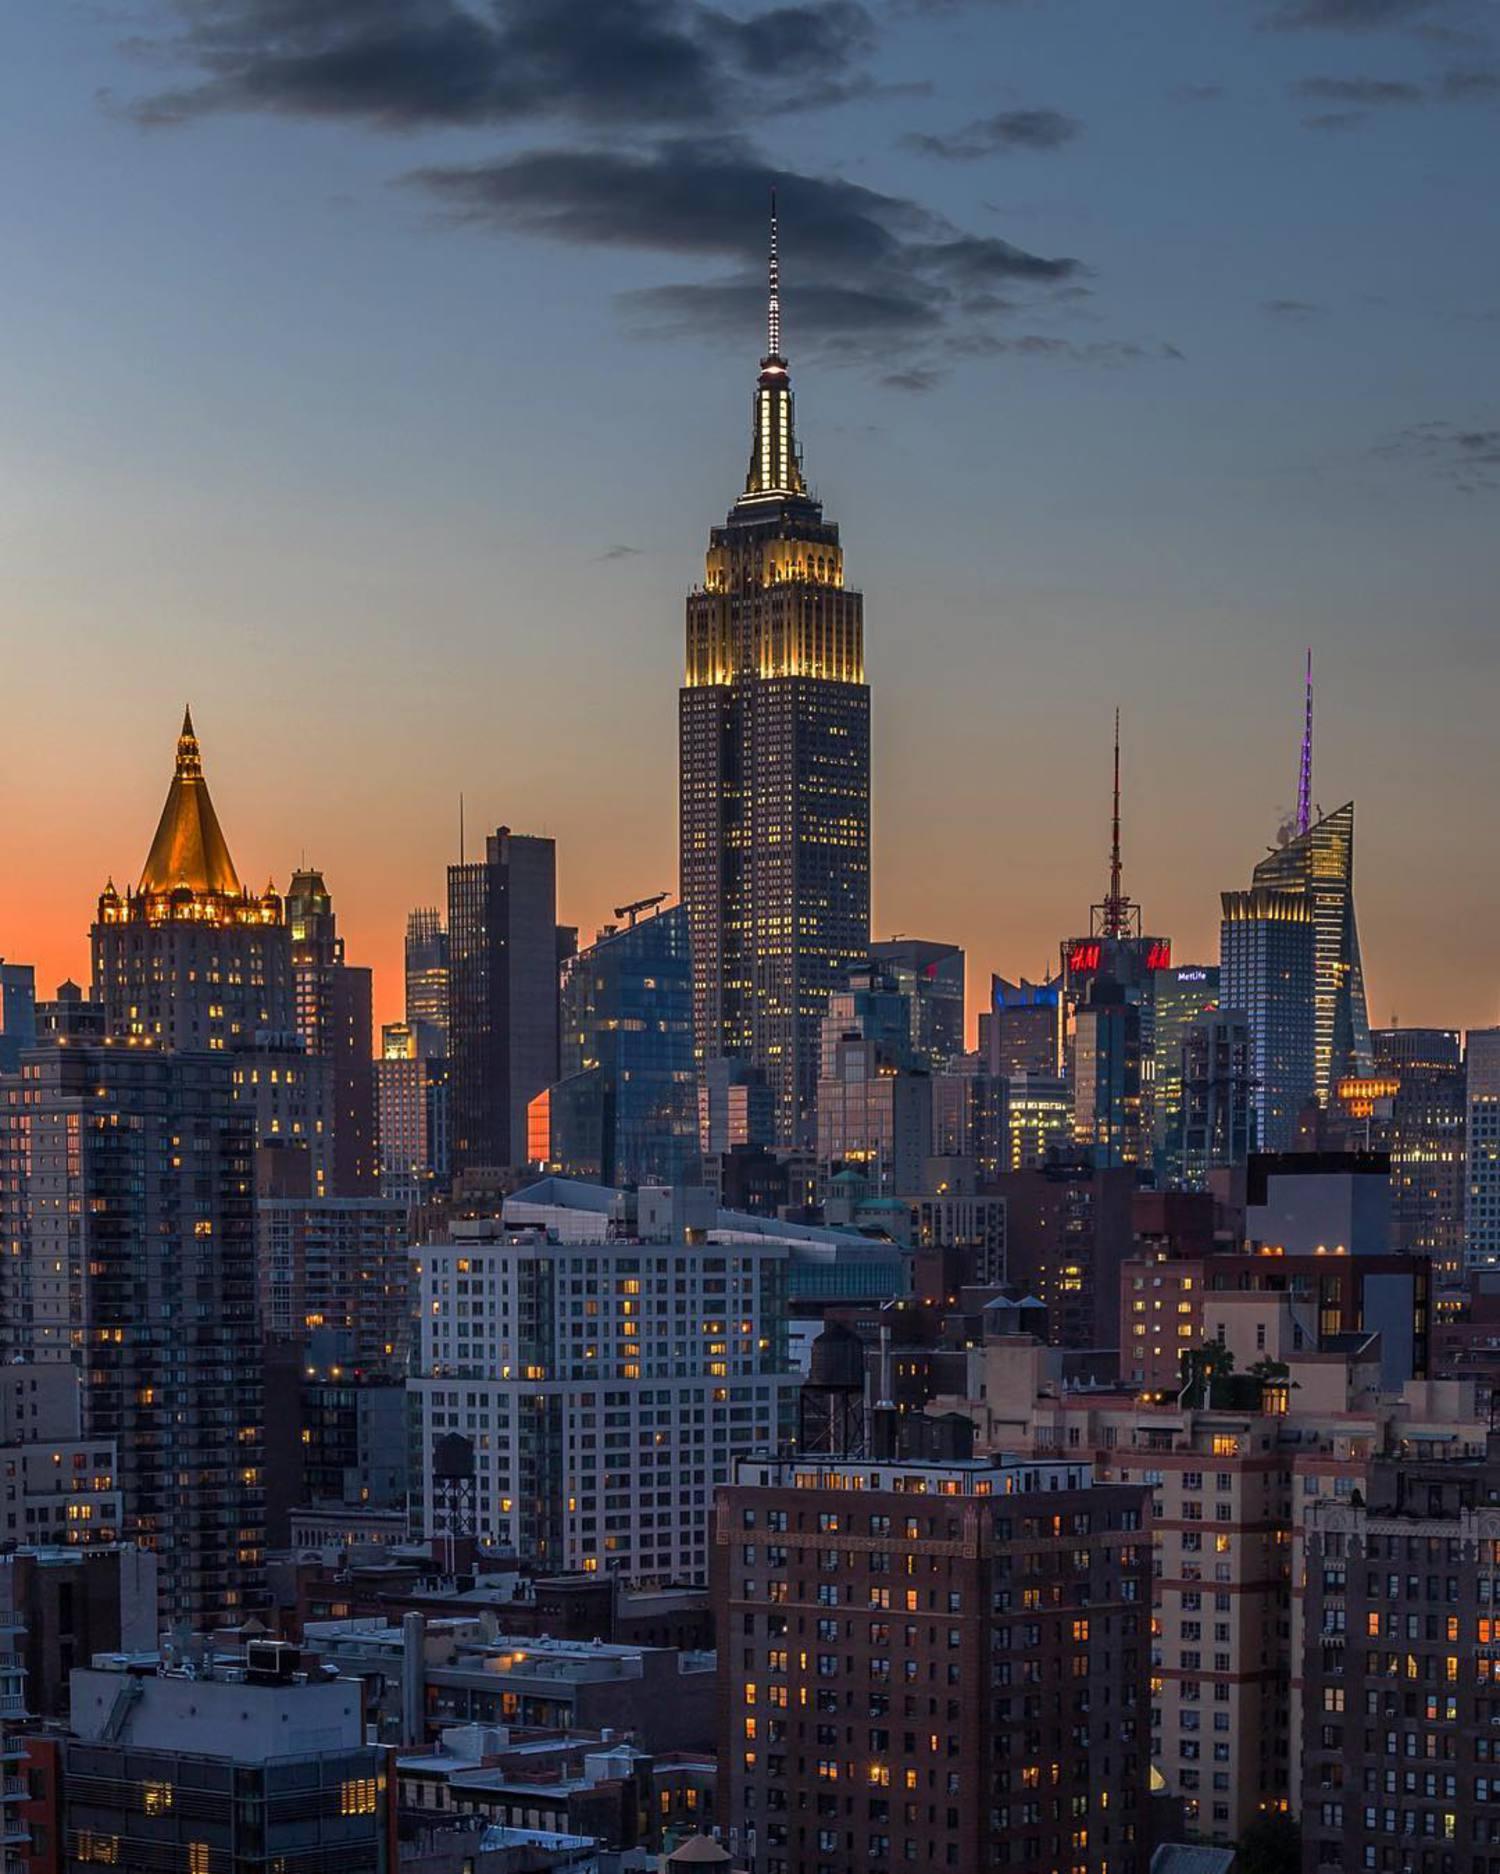 •Pins & Needles• ******************************************** #made_in_ny #ig_nycity #my_flagrants #nbc4ny #abc7ny #NYDNgram #newyorkforall #ig_global_life #picture_to_keep #seeyourcity #shootersofnyc #super_americas #thebest_capture #usaprimeshot #ugnycgrammers #topnewyorkphoto #waysofnyc #newyork_instagram #welovethiscity #inspiring_photography_admired #what_i_saw_in_nyc #wildnewyork #instagramnyc #agameoftones #icapture_nyc #royalsnappingartists #TNYR #NYCityworld #ILove_newyo #NYLoveYou